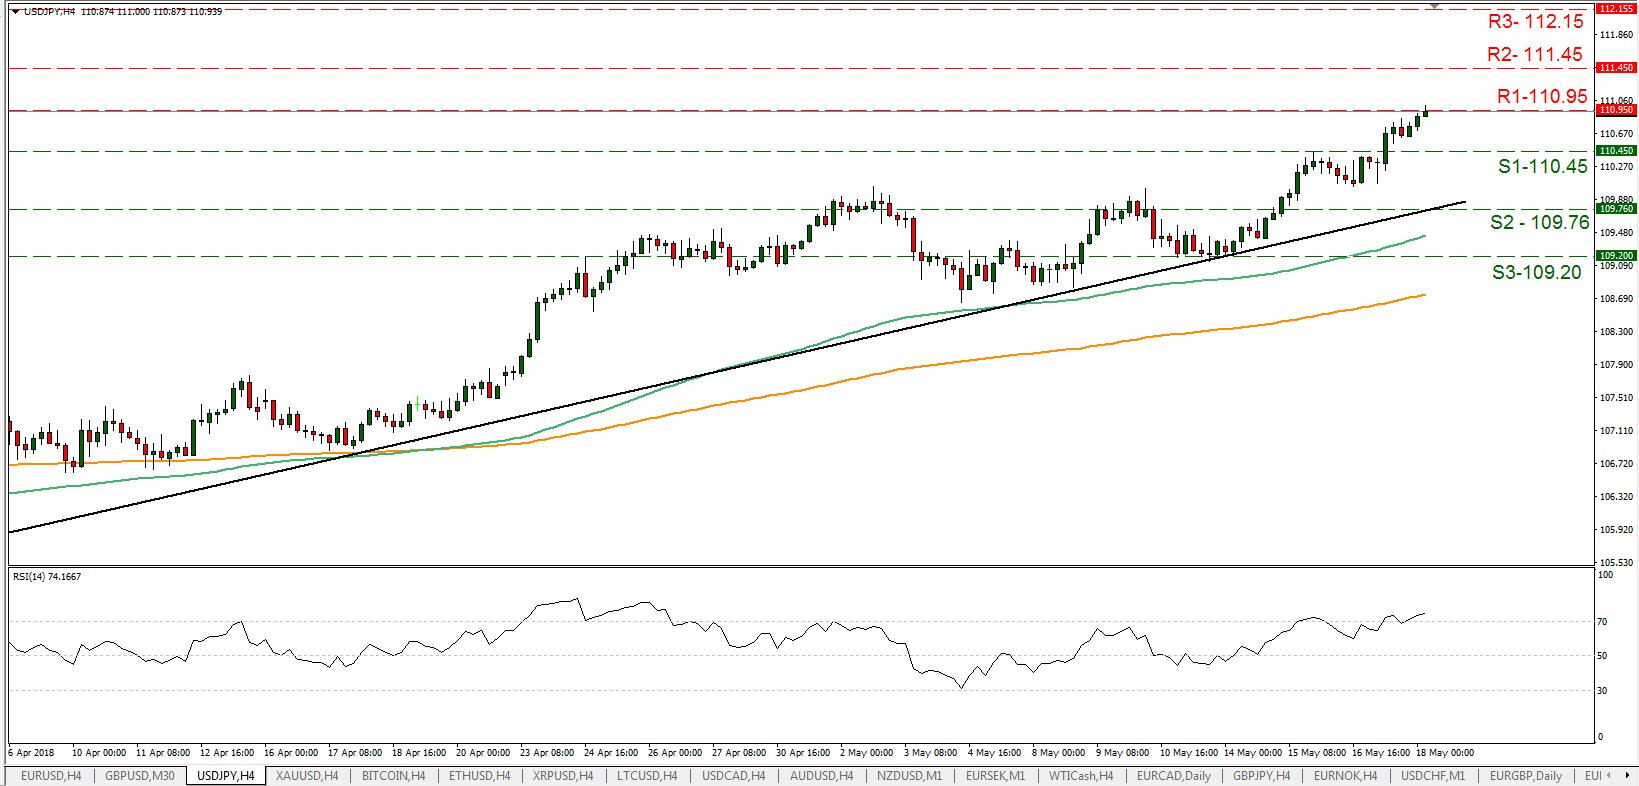 USD/JPY 18/05/2018 | EconAlerts